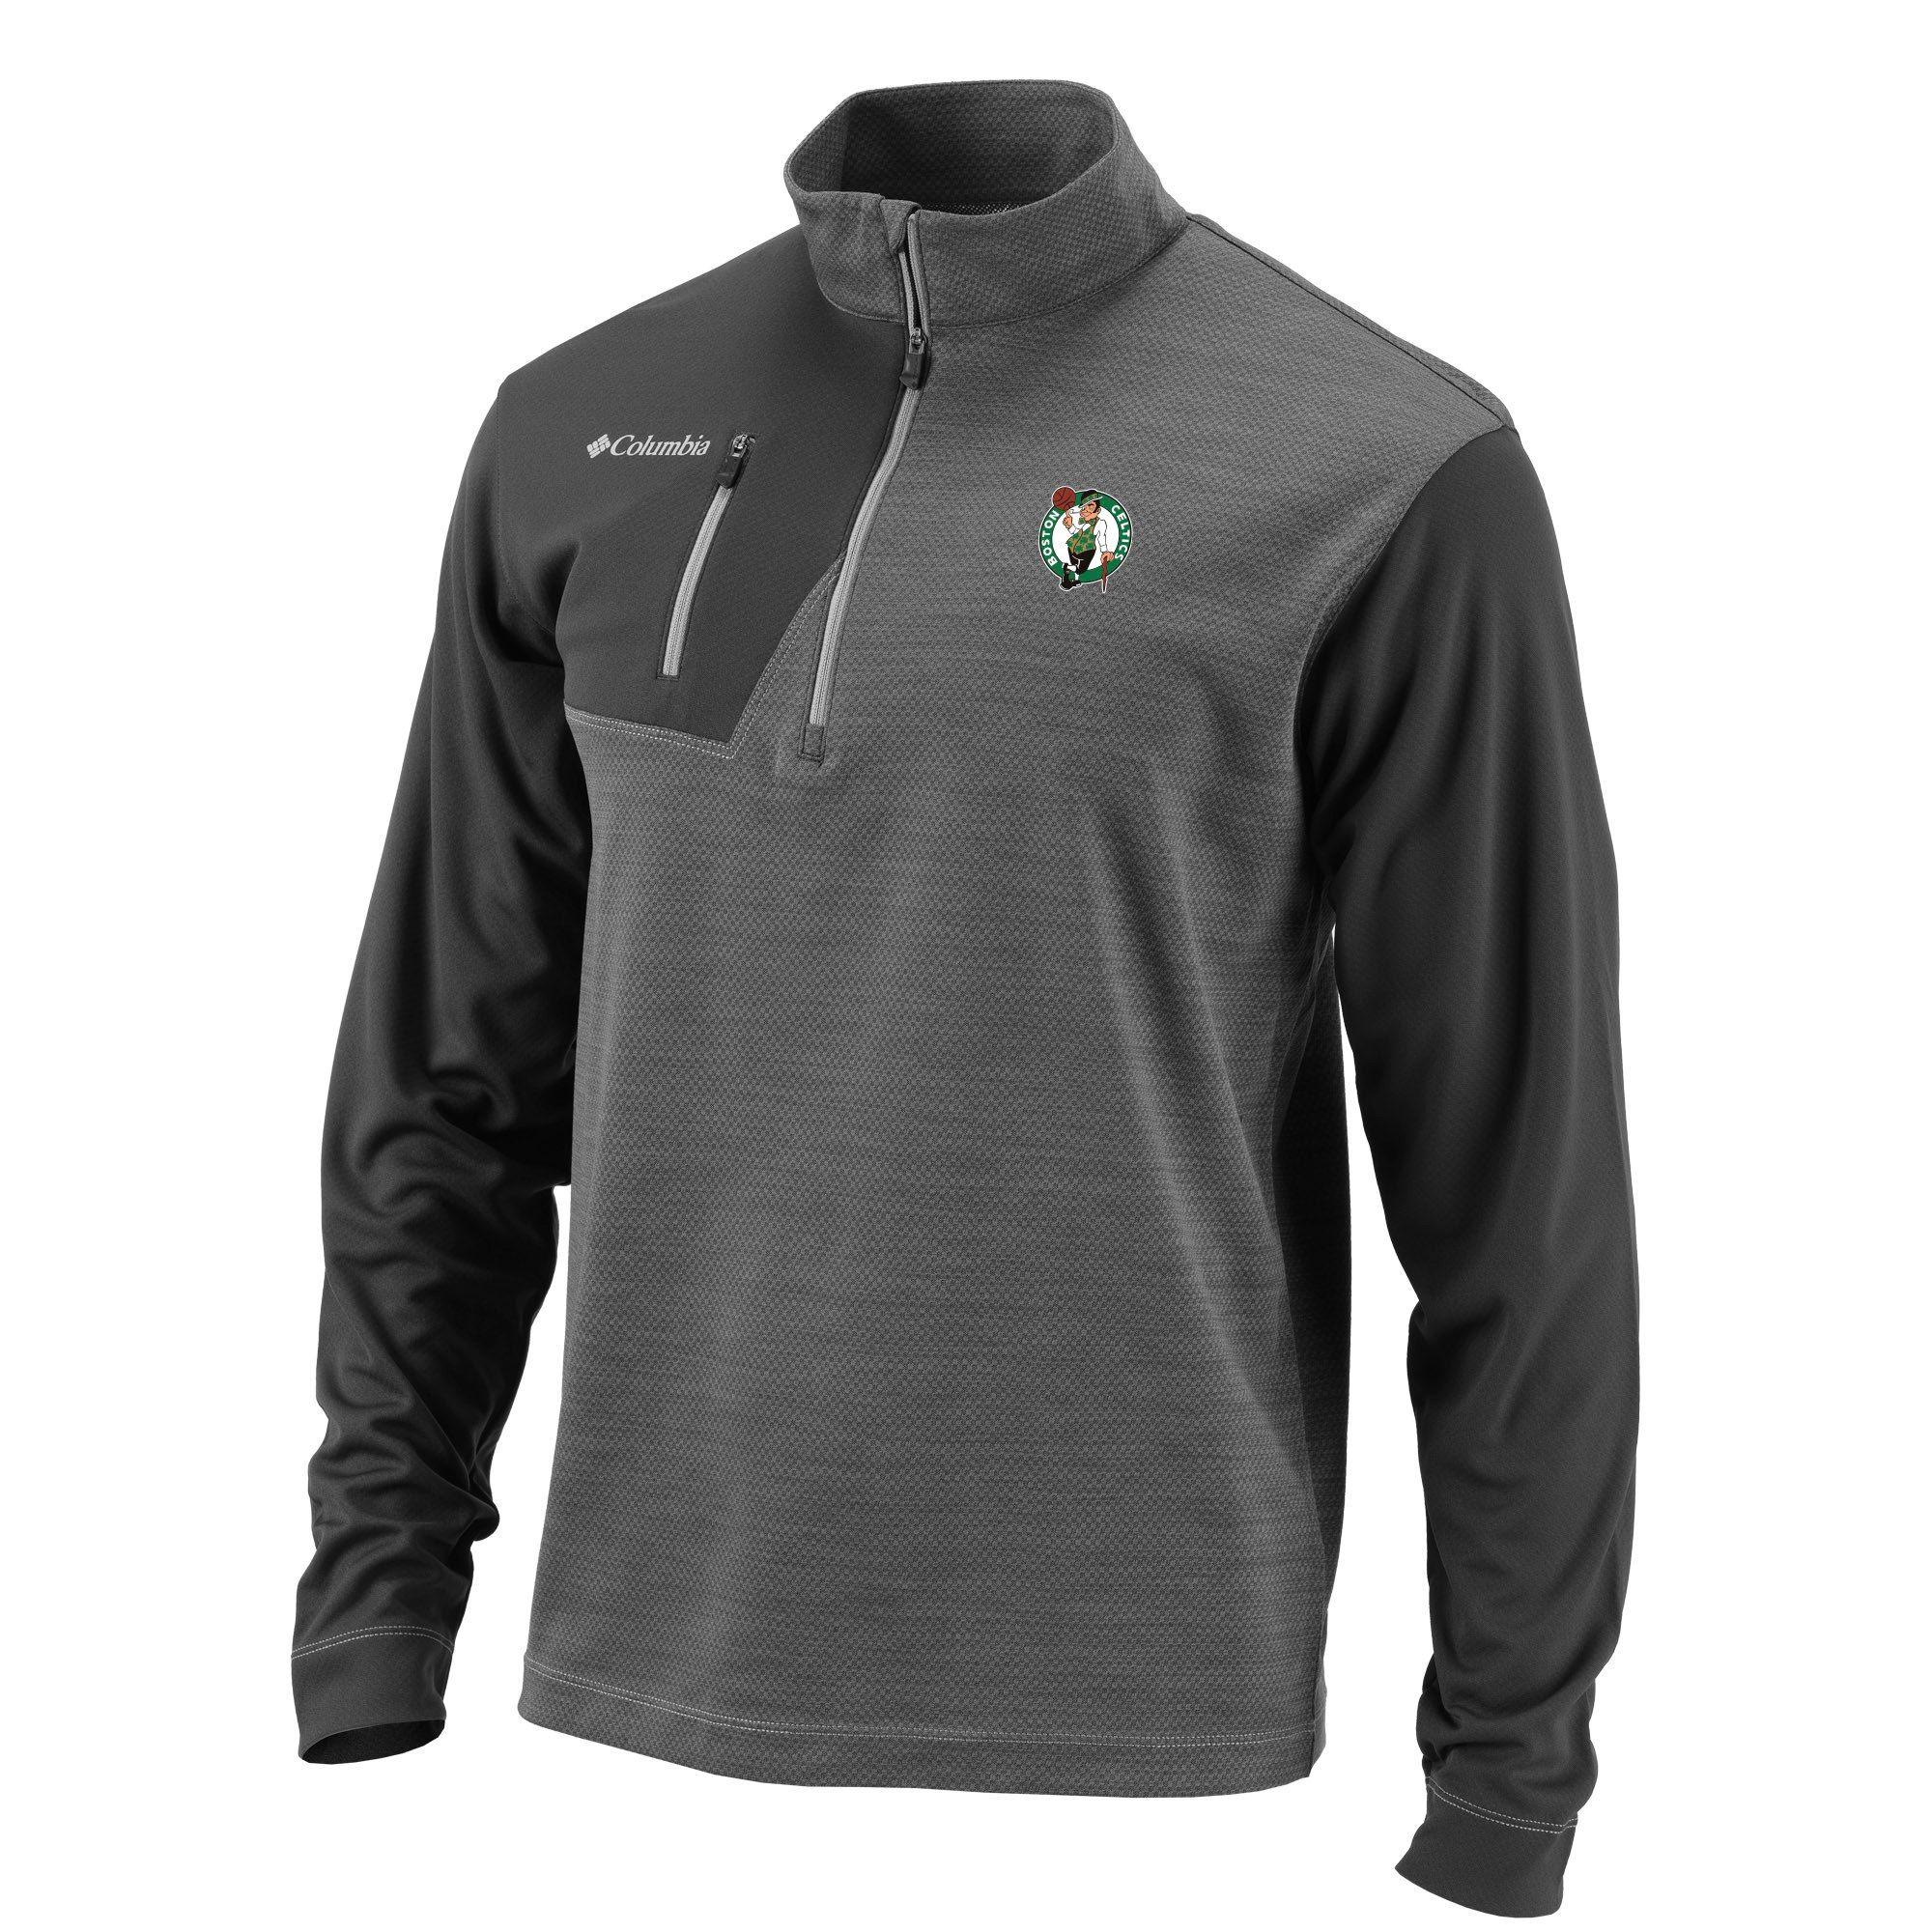 4f1420aac Men's Boston Celtics Columbia Gray Omni-Heat Regulation Quarter-Zip  Pullover Jacket